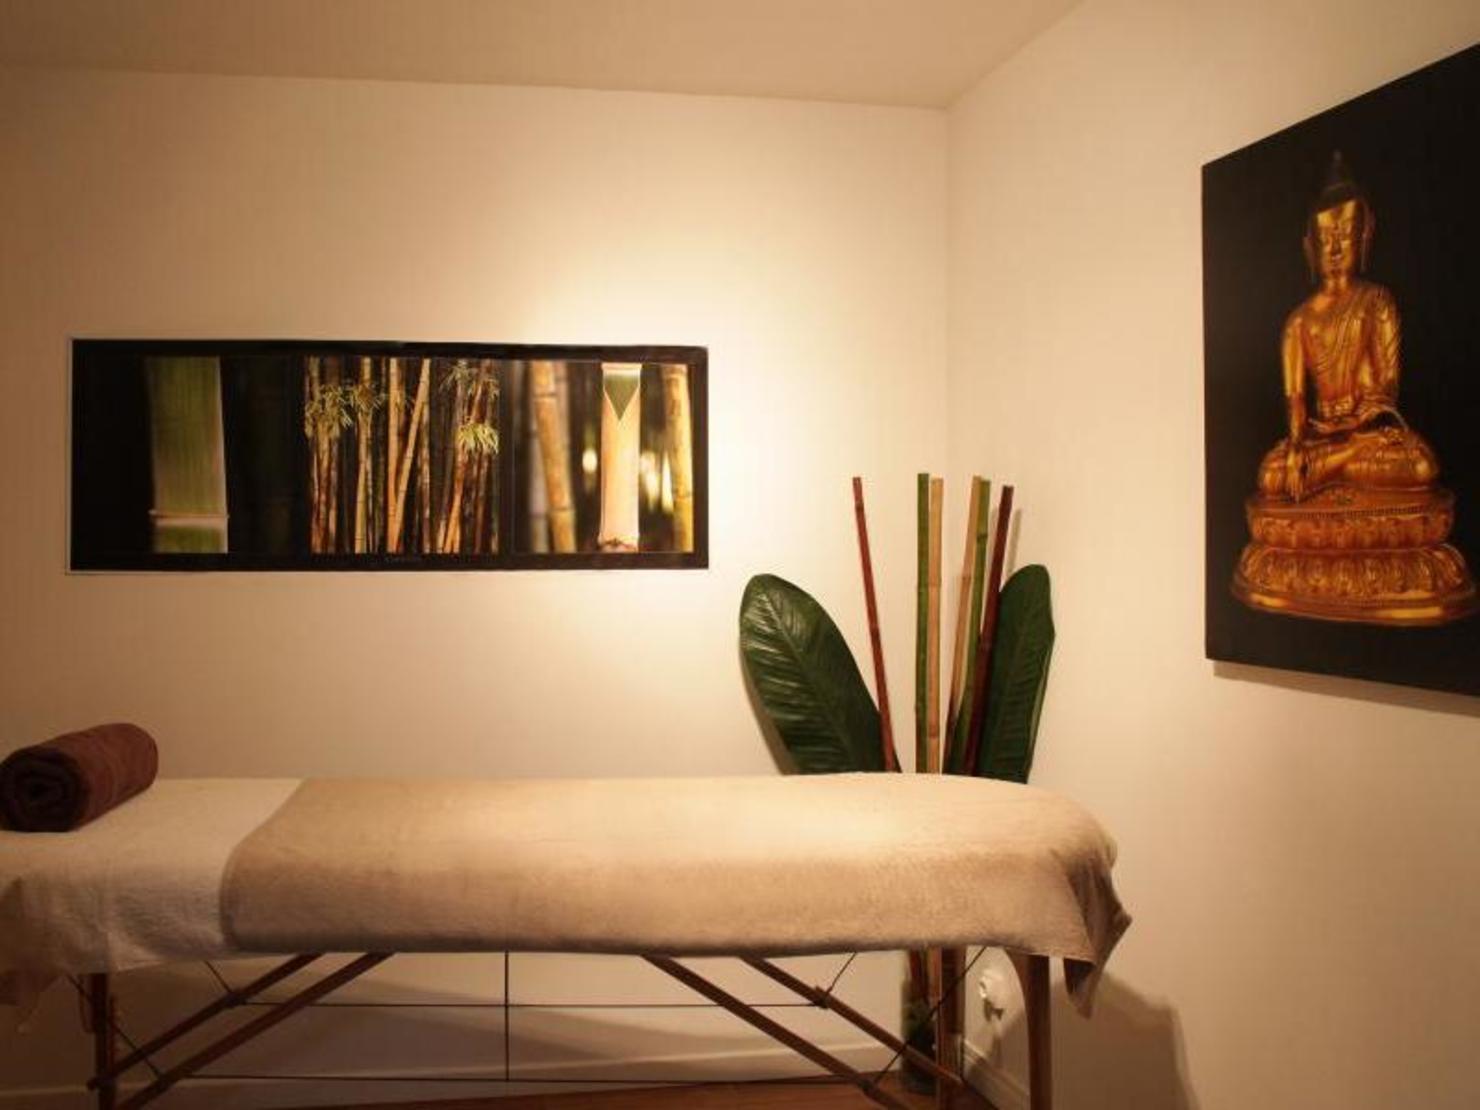 femmes en forme marseille tarifs avis horaires essai gratuit. Black Bedroom Furniture Sets. Home Design Ideas